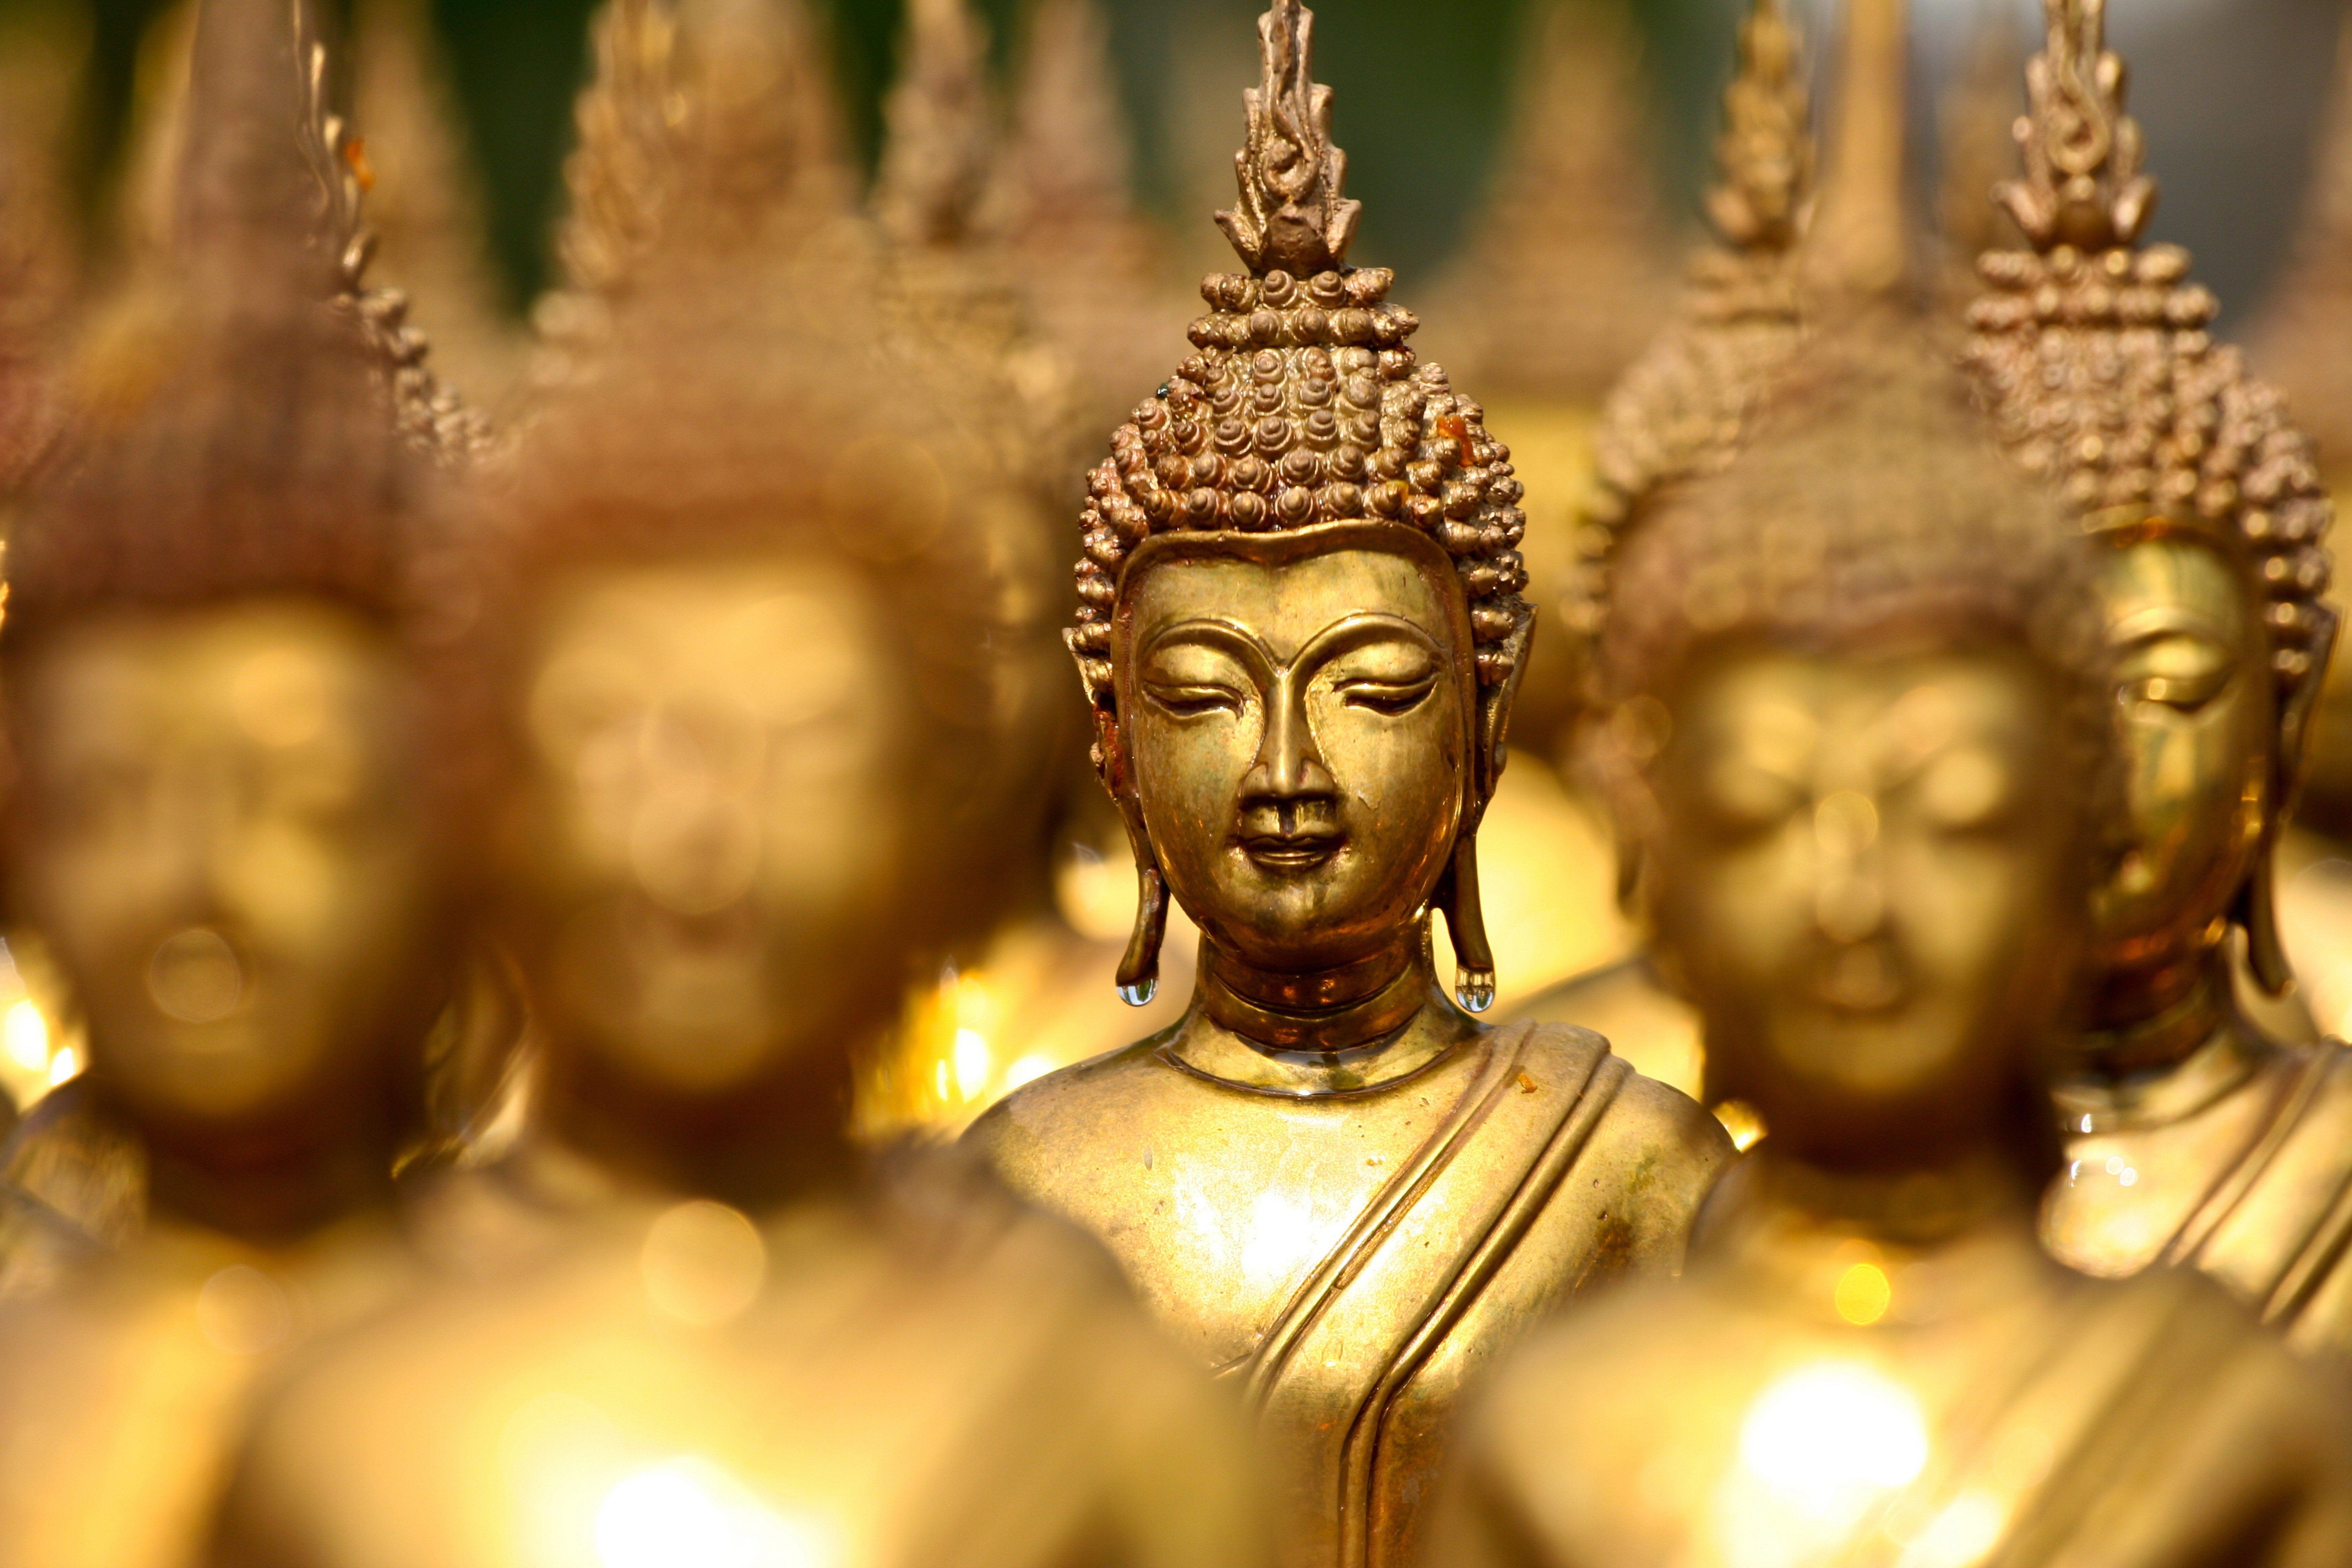 Buddha Wallpaper 8k: Top Free Buddha HD Backgrounds